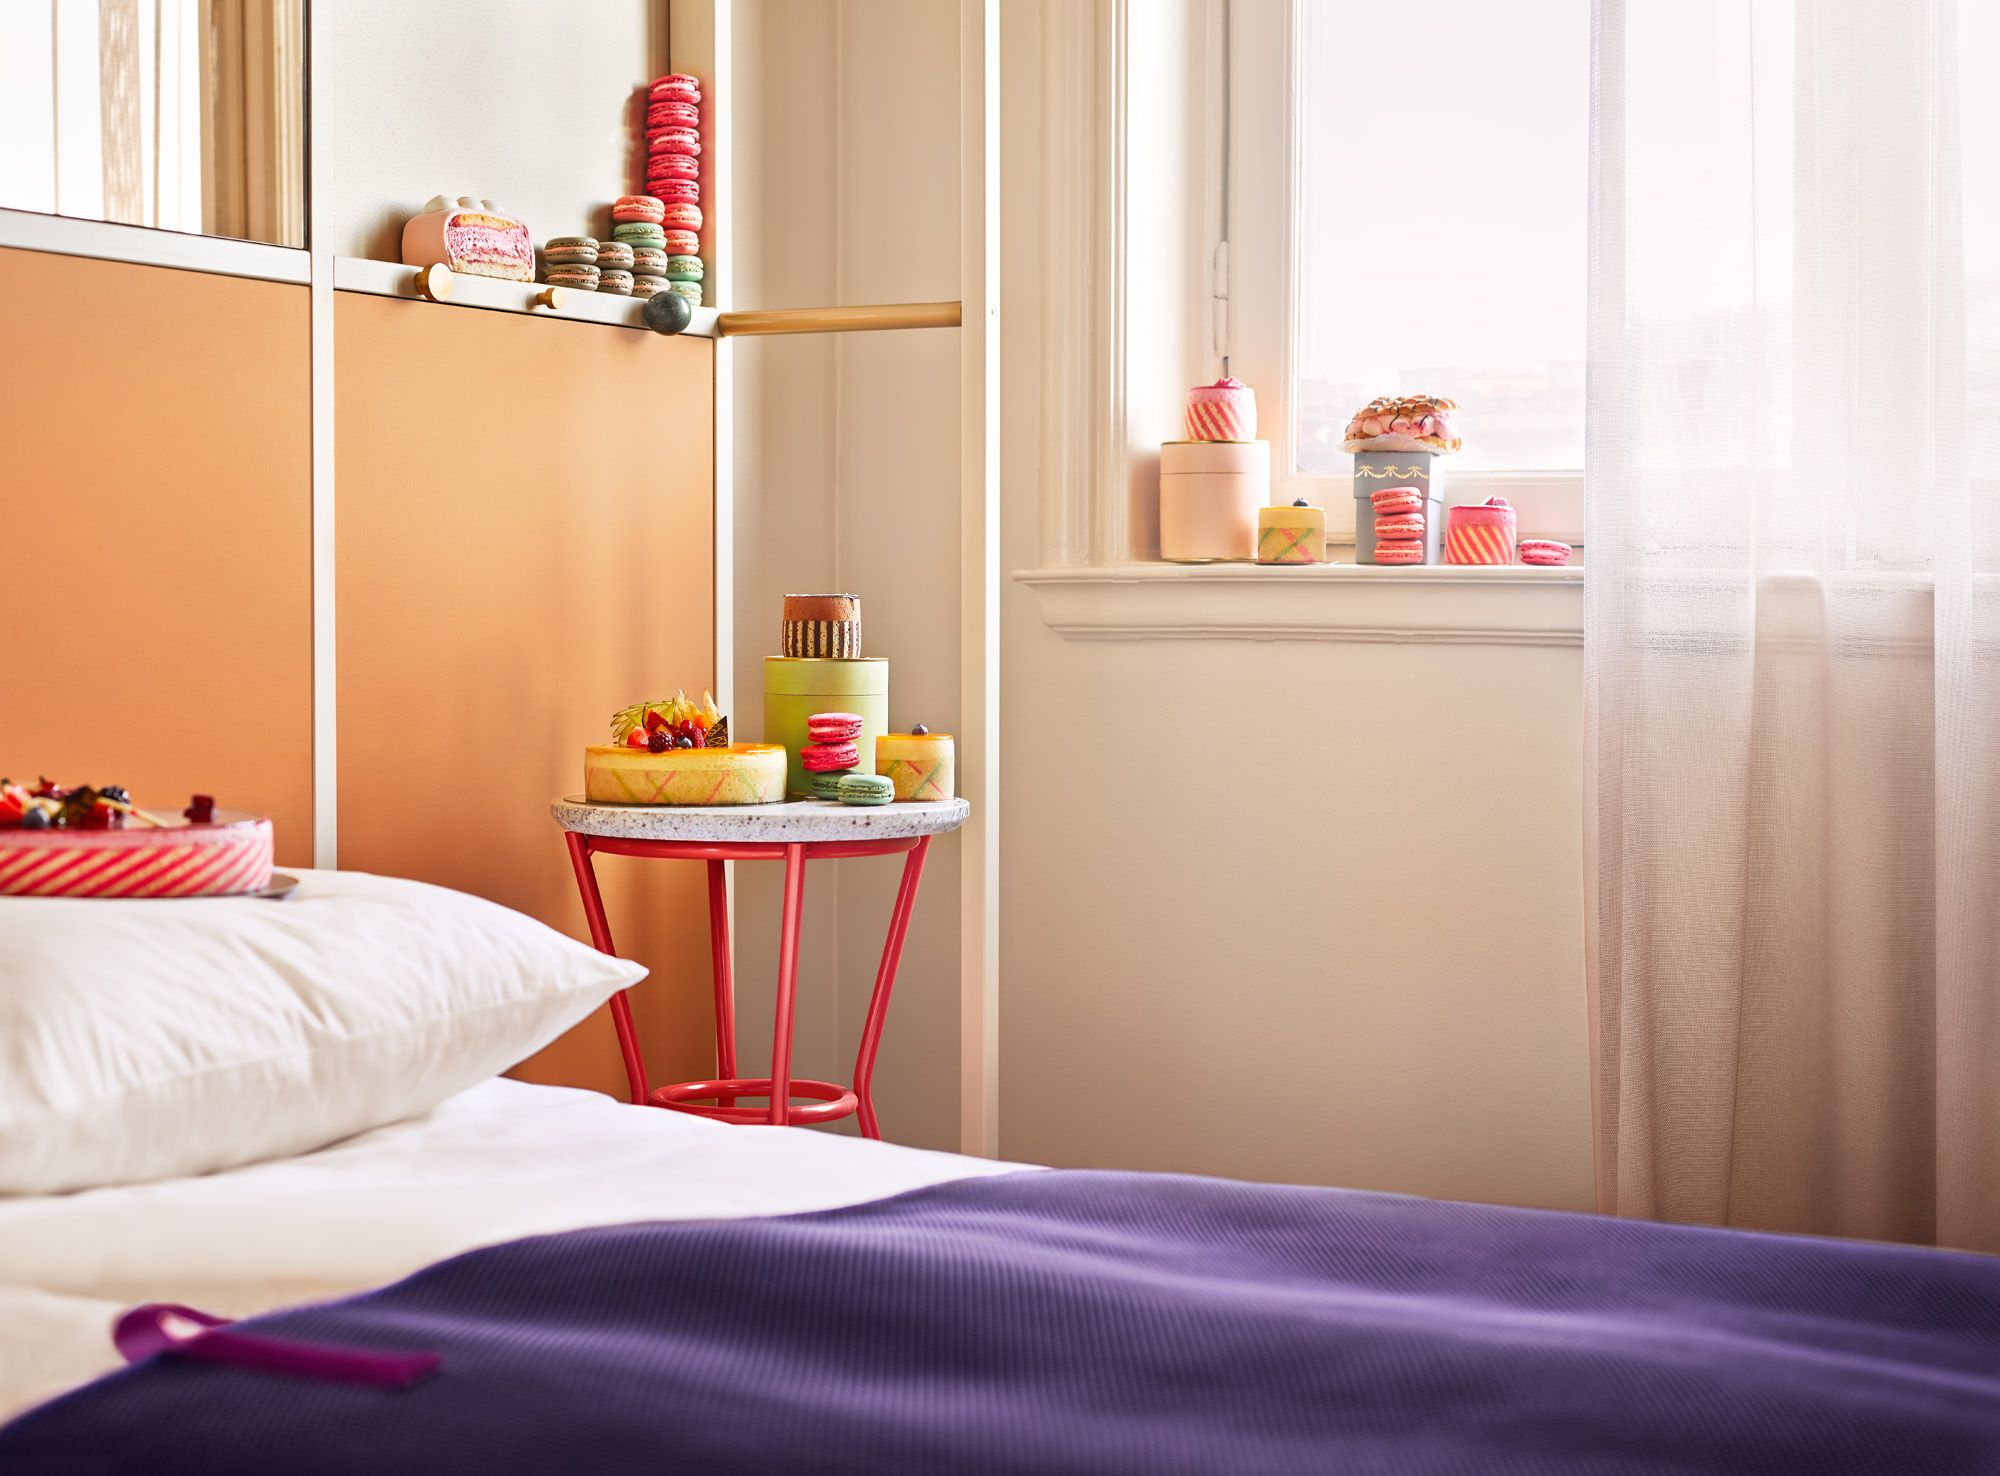 design pinterest stockholm google. Explore Hotel Stockholm, Concept And More! Design Pinterest Stockholm Google